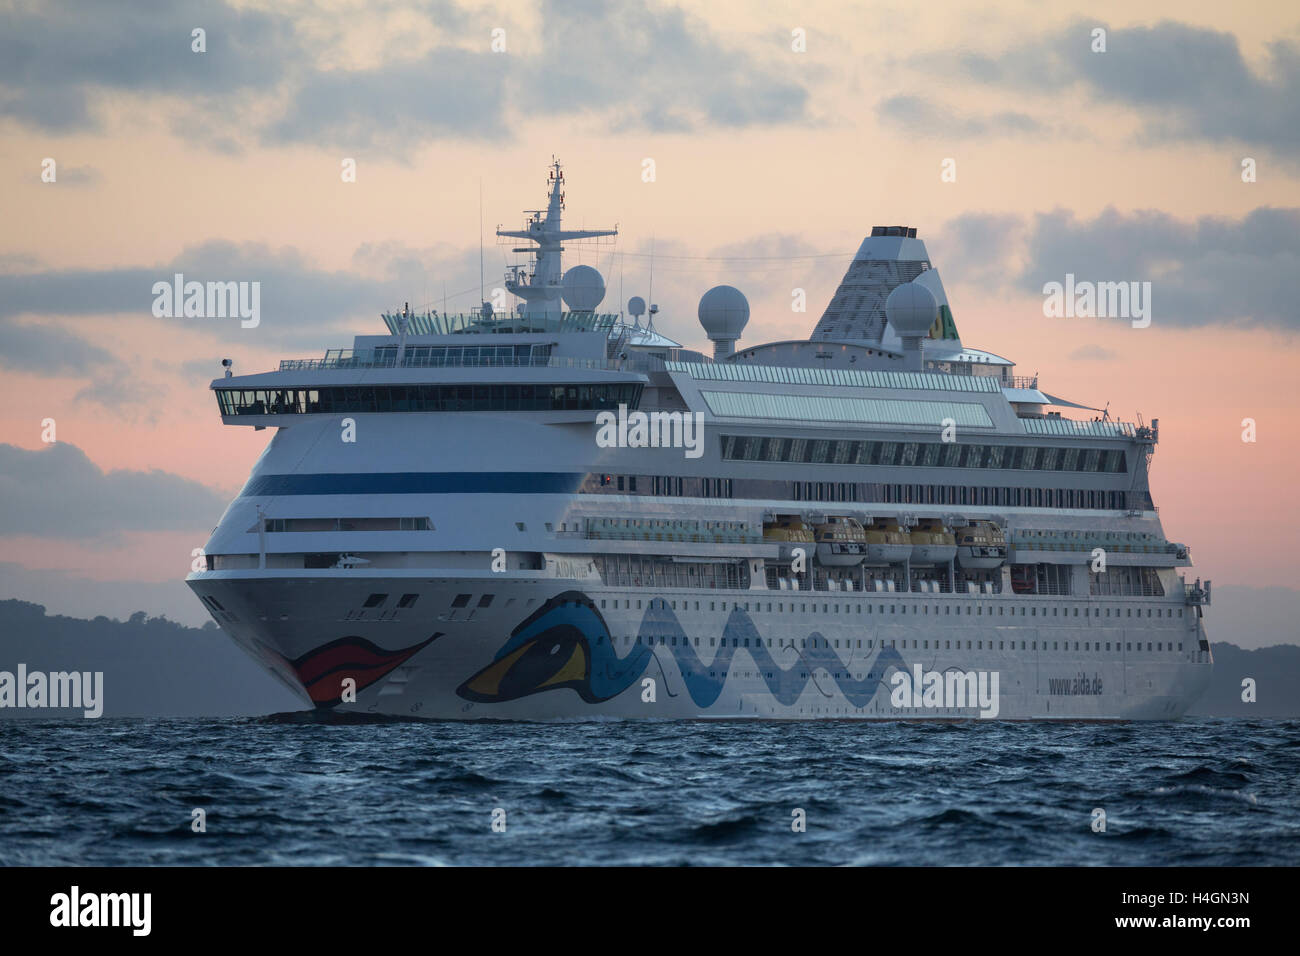 The cruise ship AIDA VITA. - Stock Image